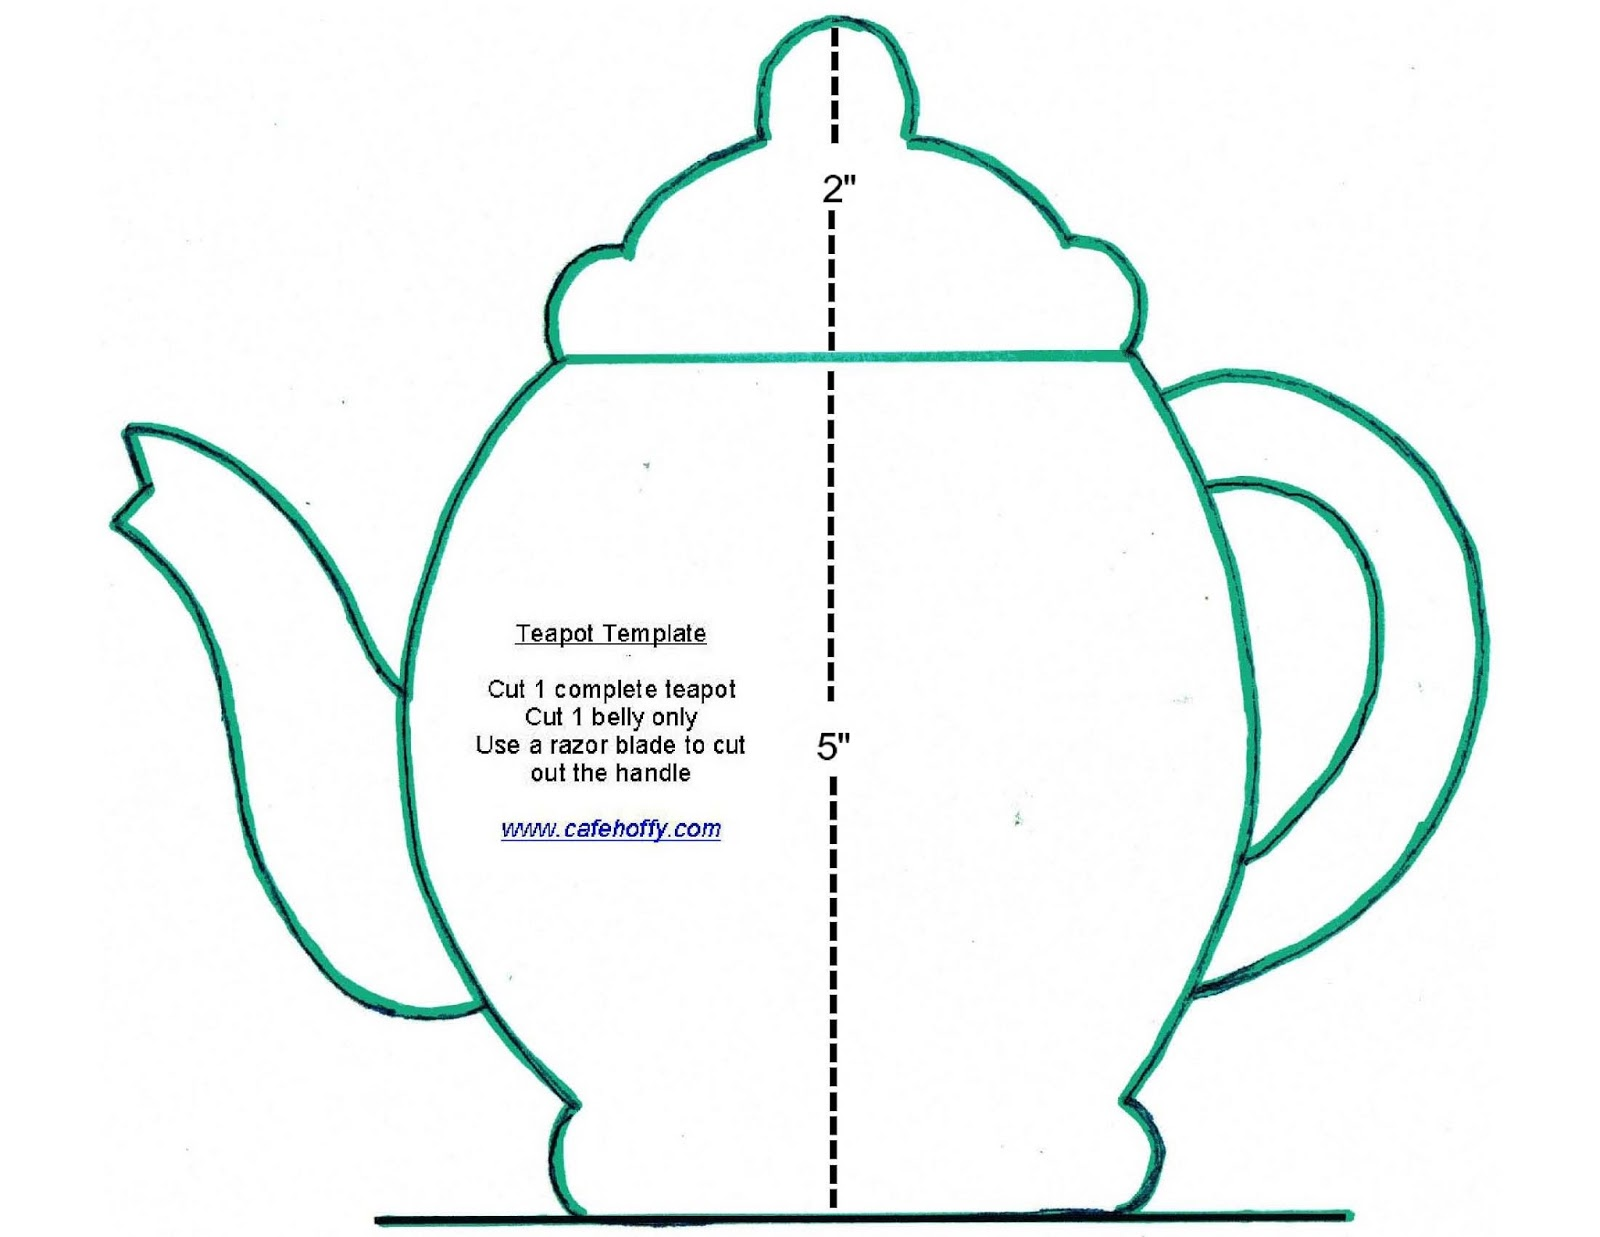 Cafe Hoffy: u0026quot;Itu0026#39;s a Party!u0026quot; - Easy Party Planning...